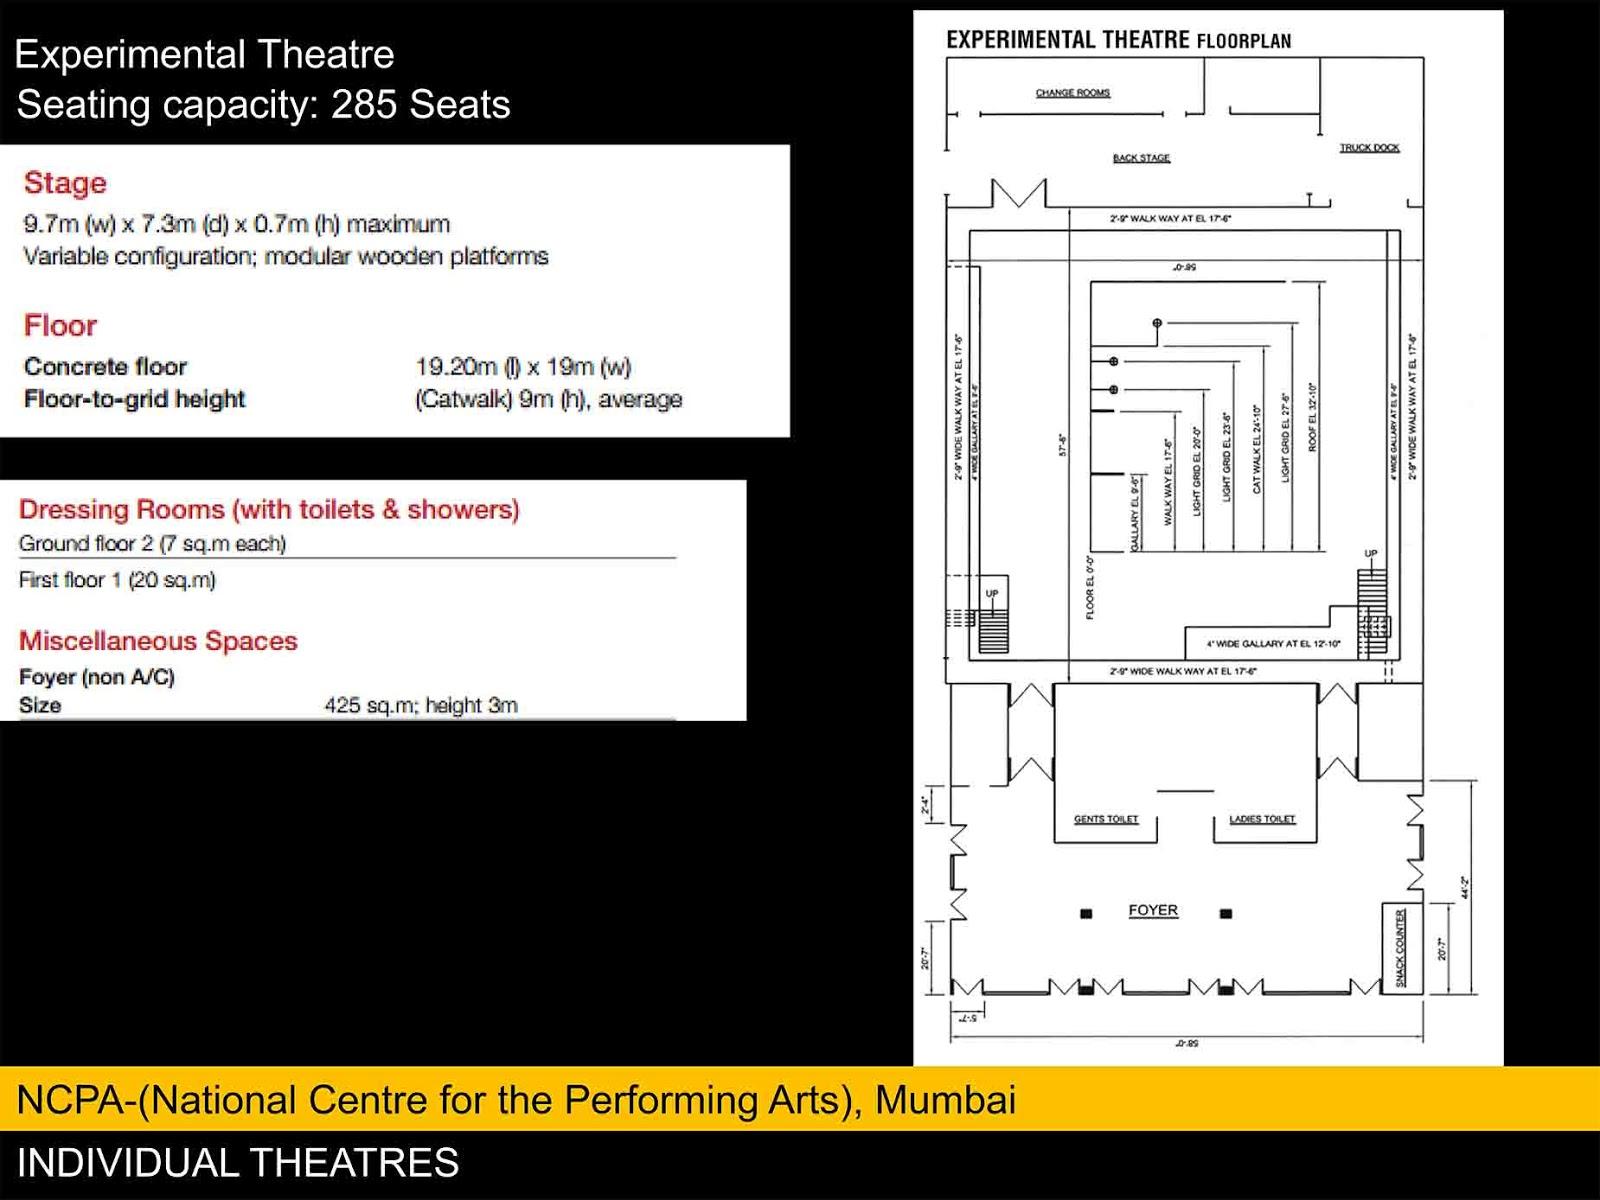 ncpa-experimental-theatre